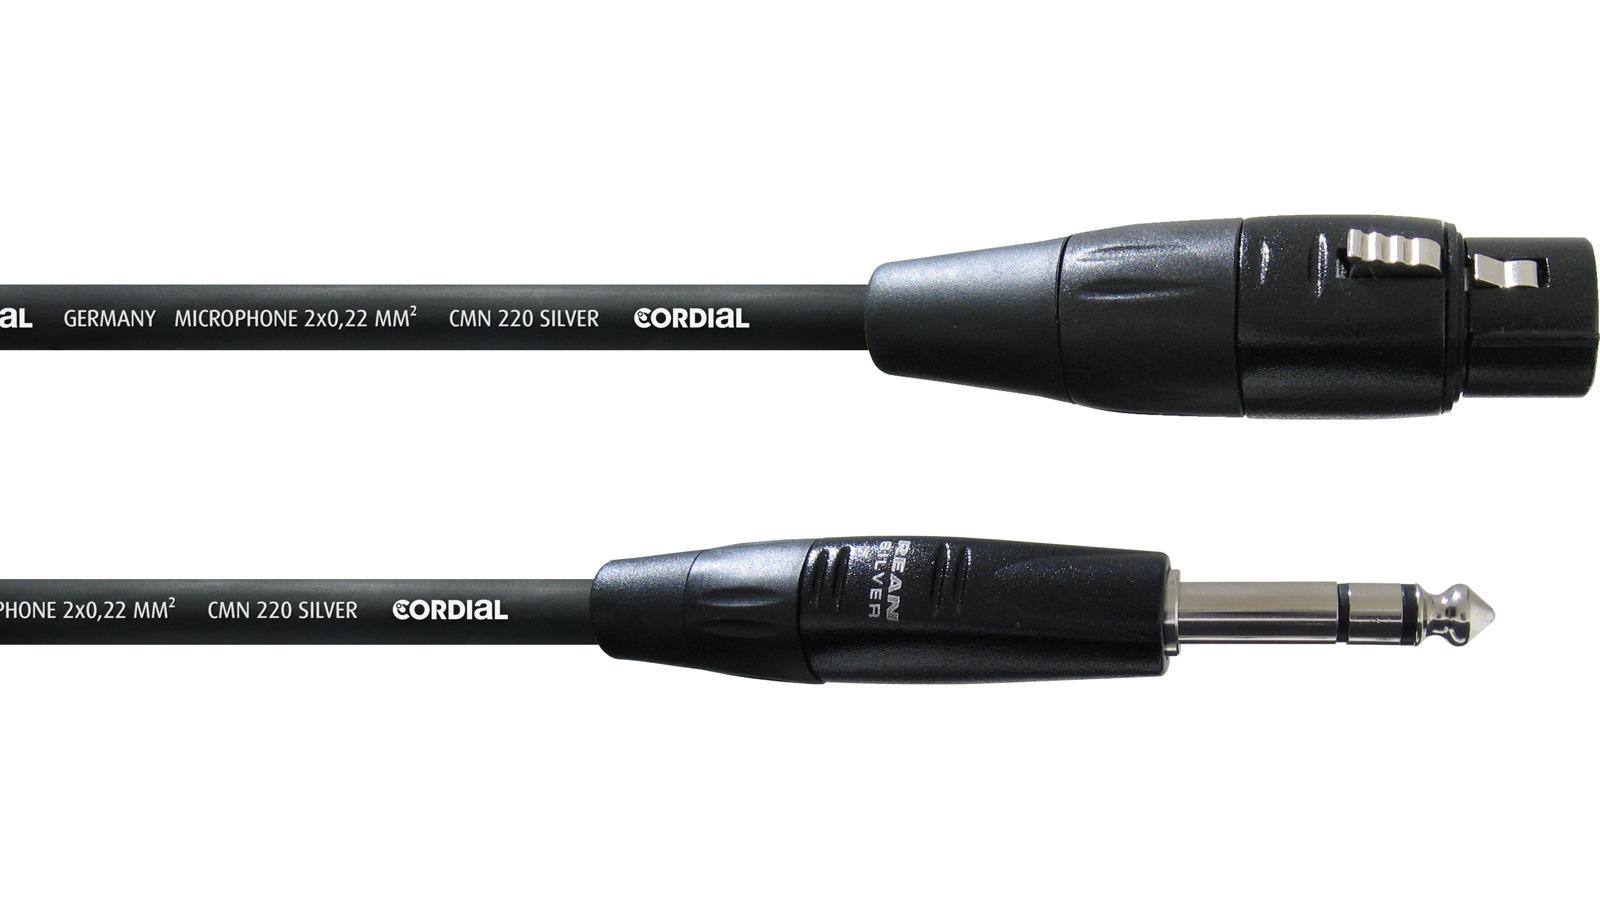 Cordial symmetrisches Klinke XLR female Mikrofonkabel 1,5 m CIM1,5FV